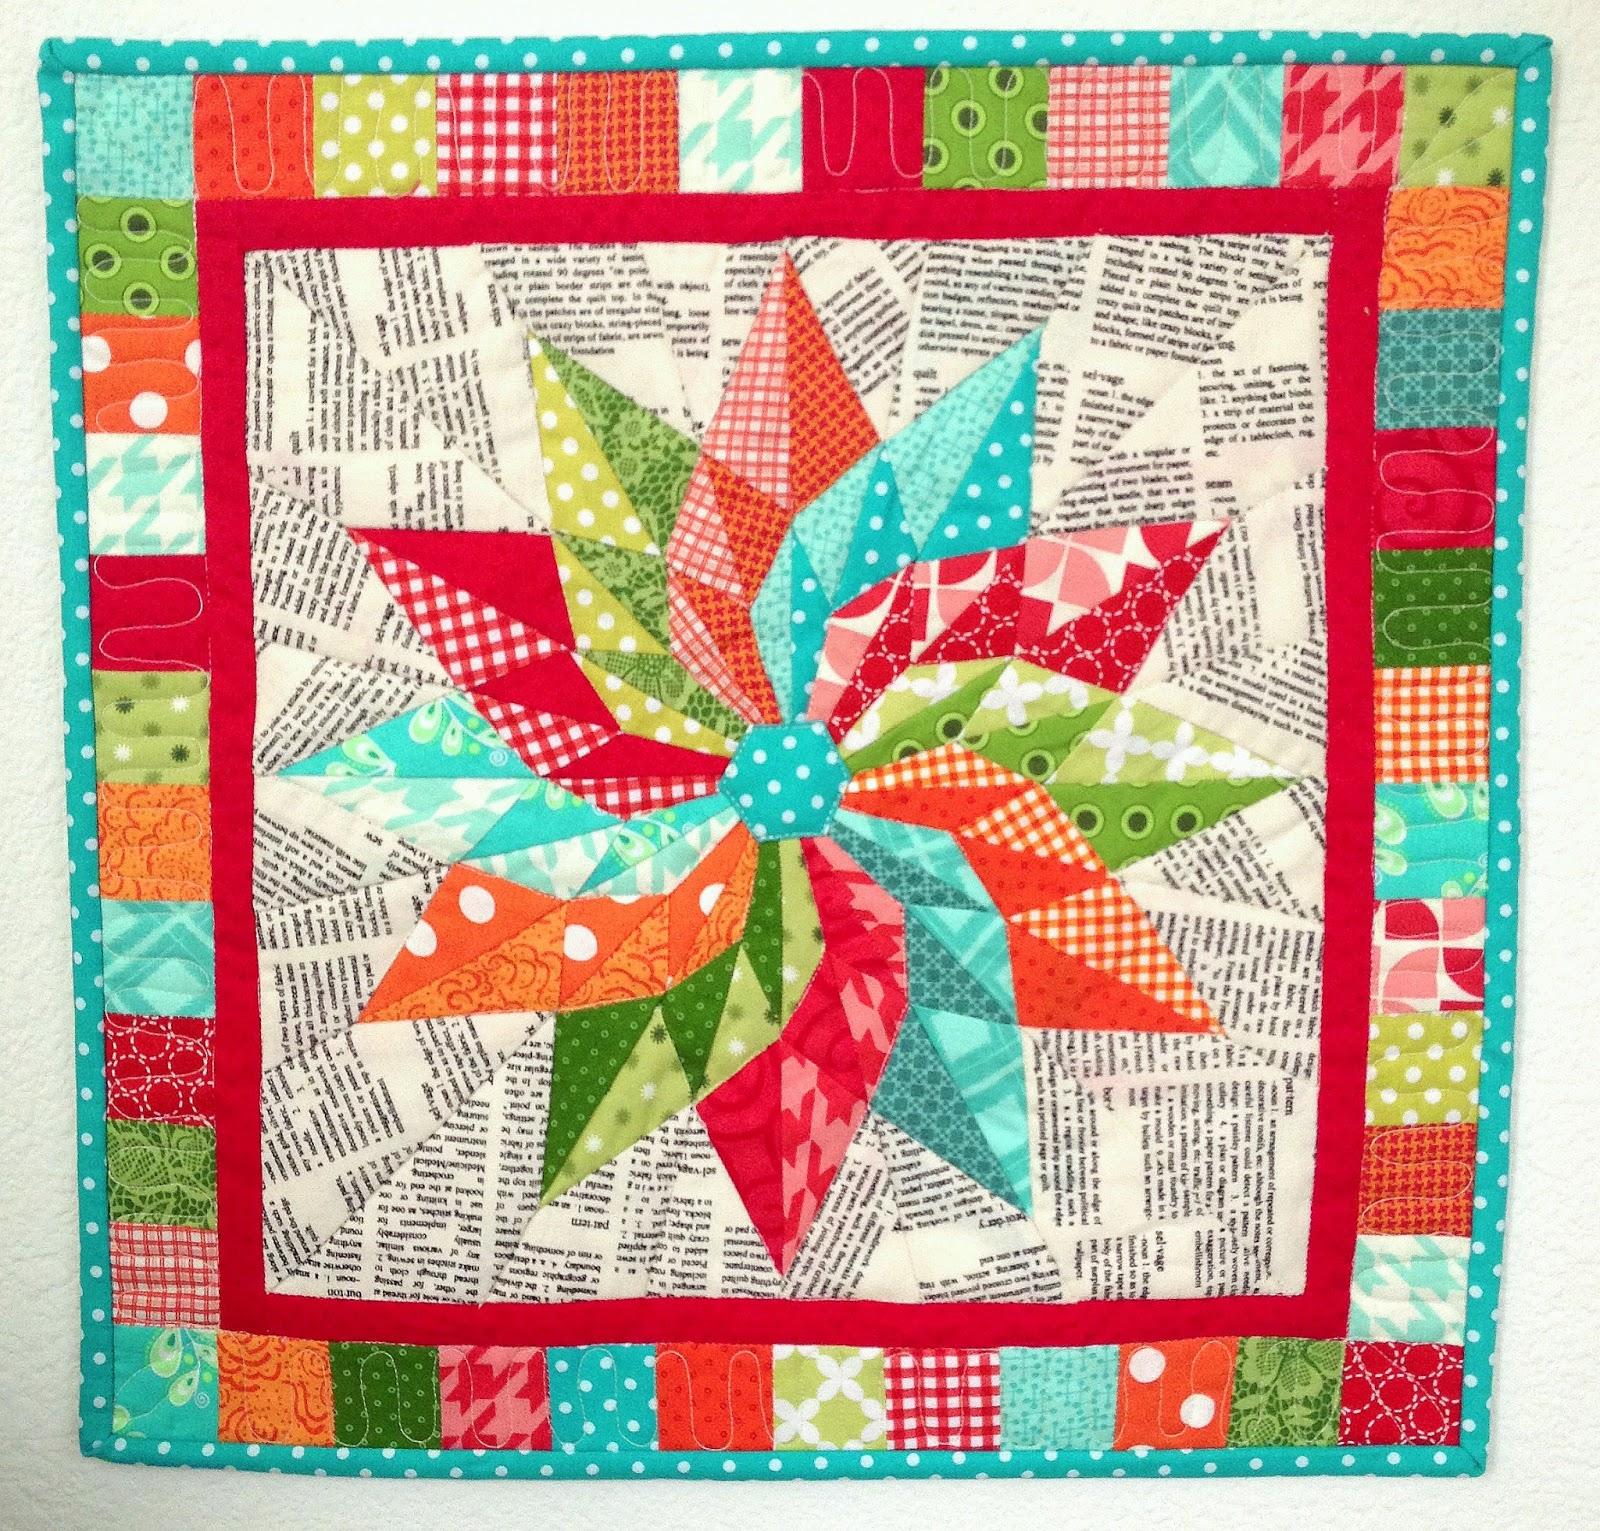 Craft Sew Create: Doll Quilt Swap 13 : create a quilt - Adamdwight.com